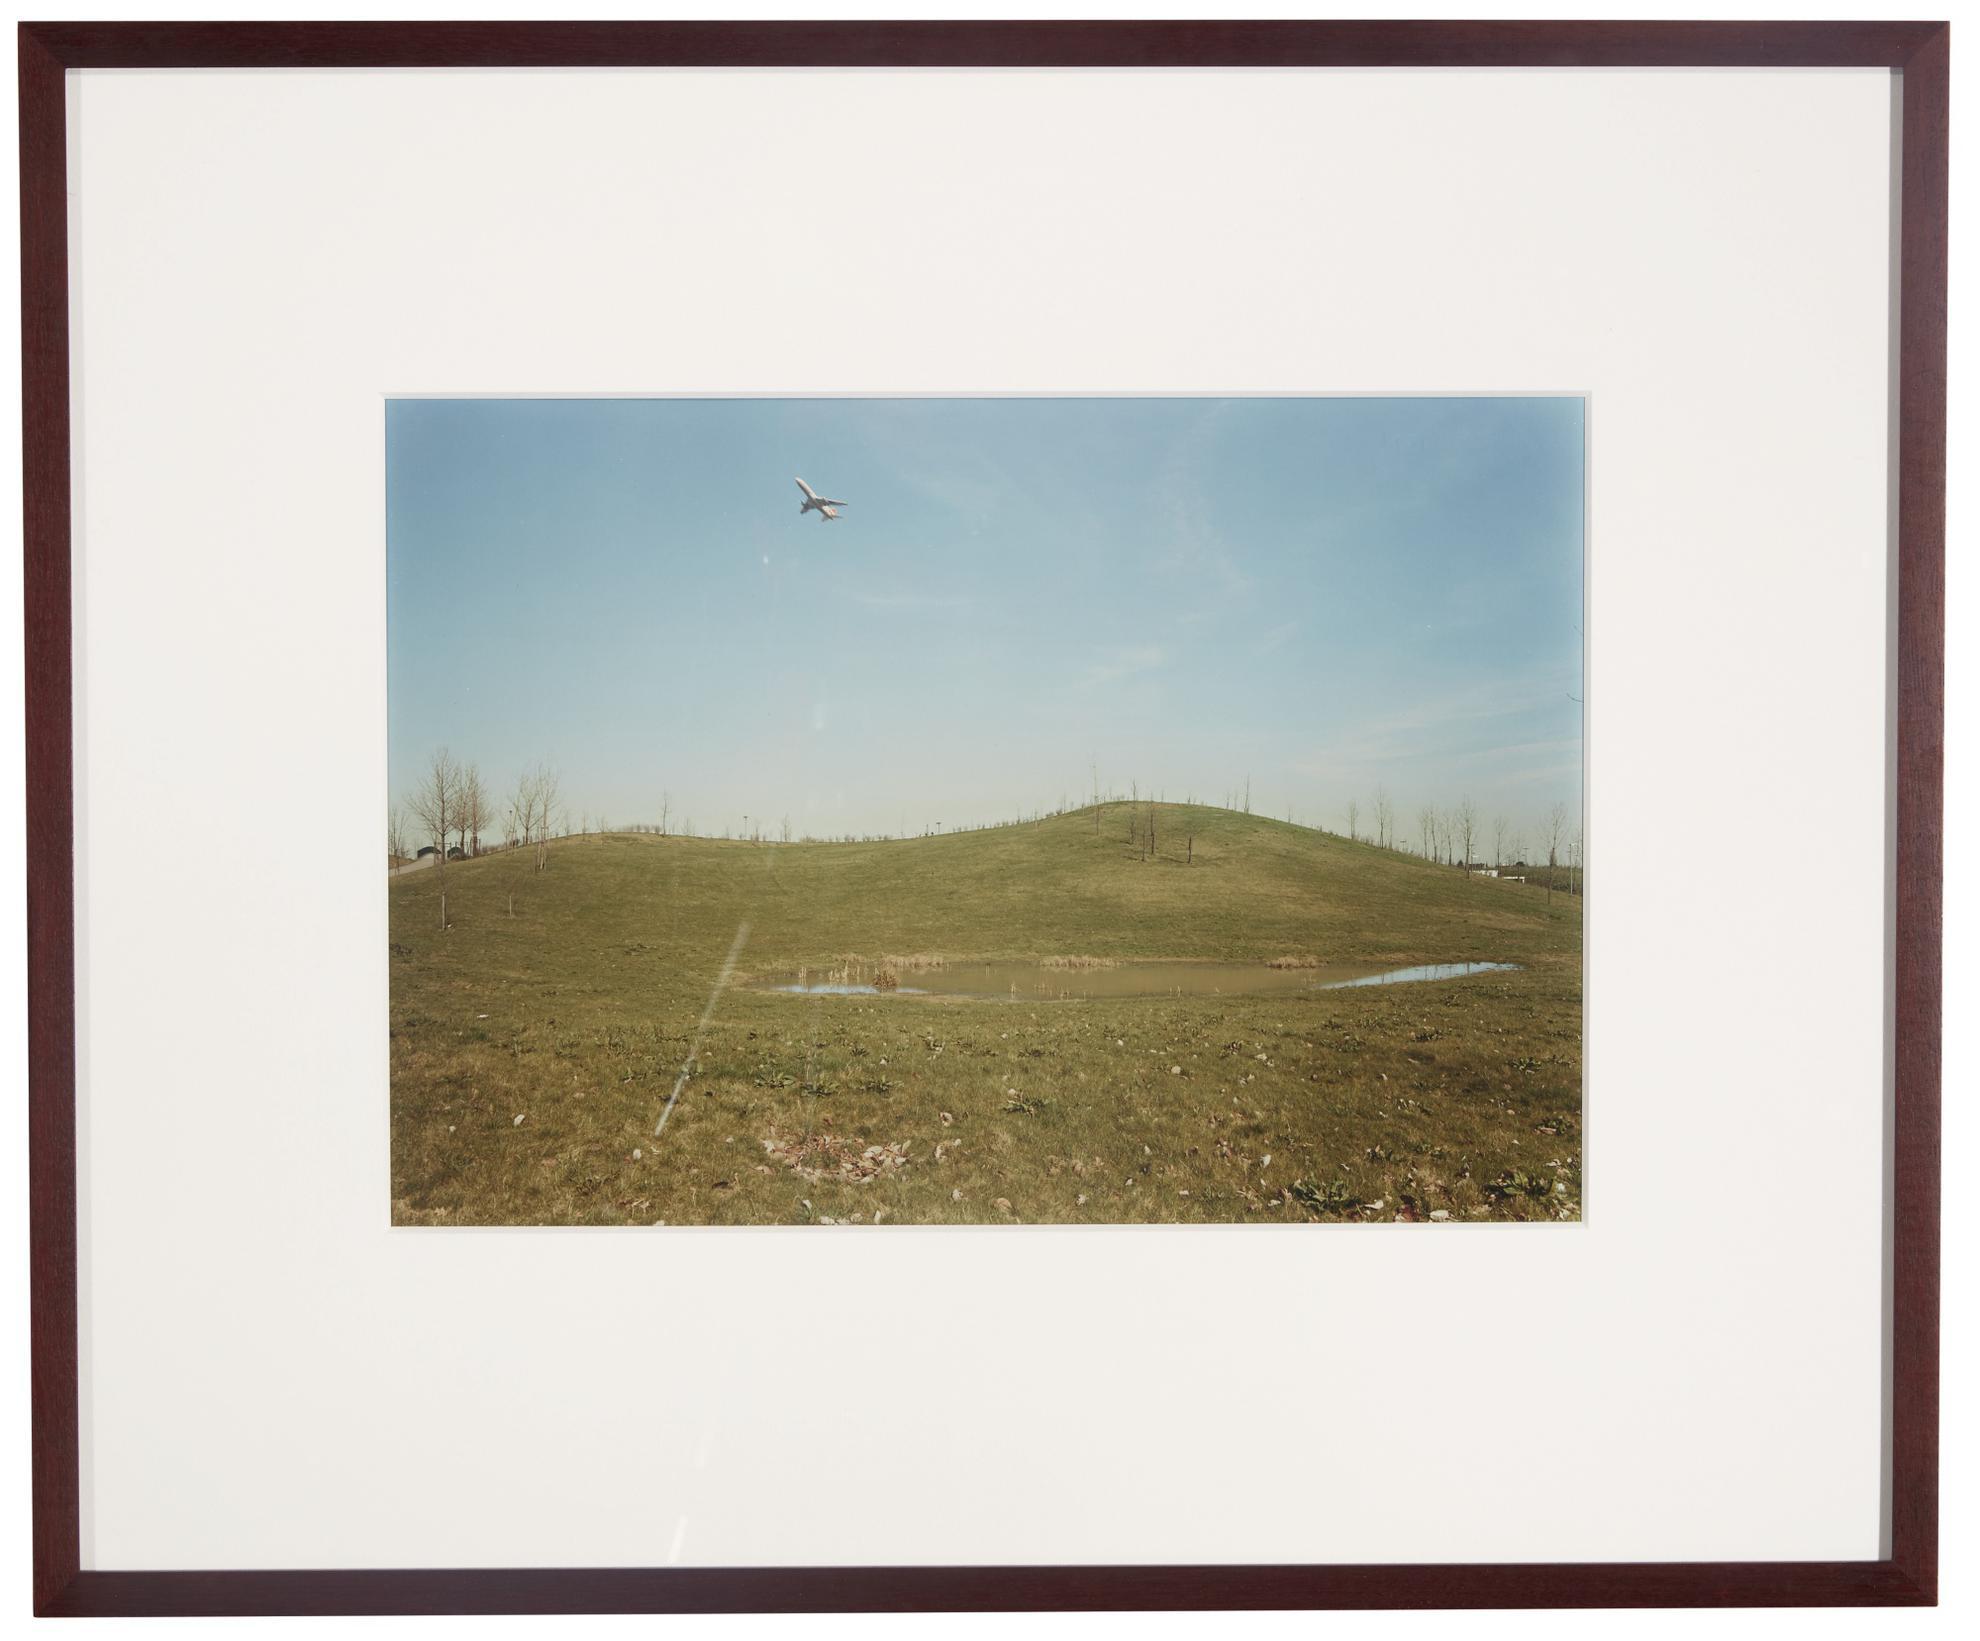 Andreas Gursky-Dusseldorf, Airplane-1989